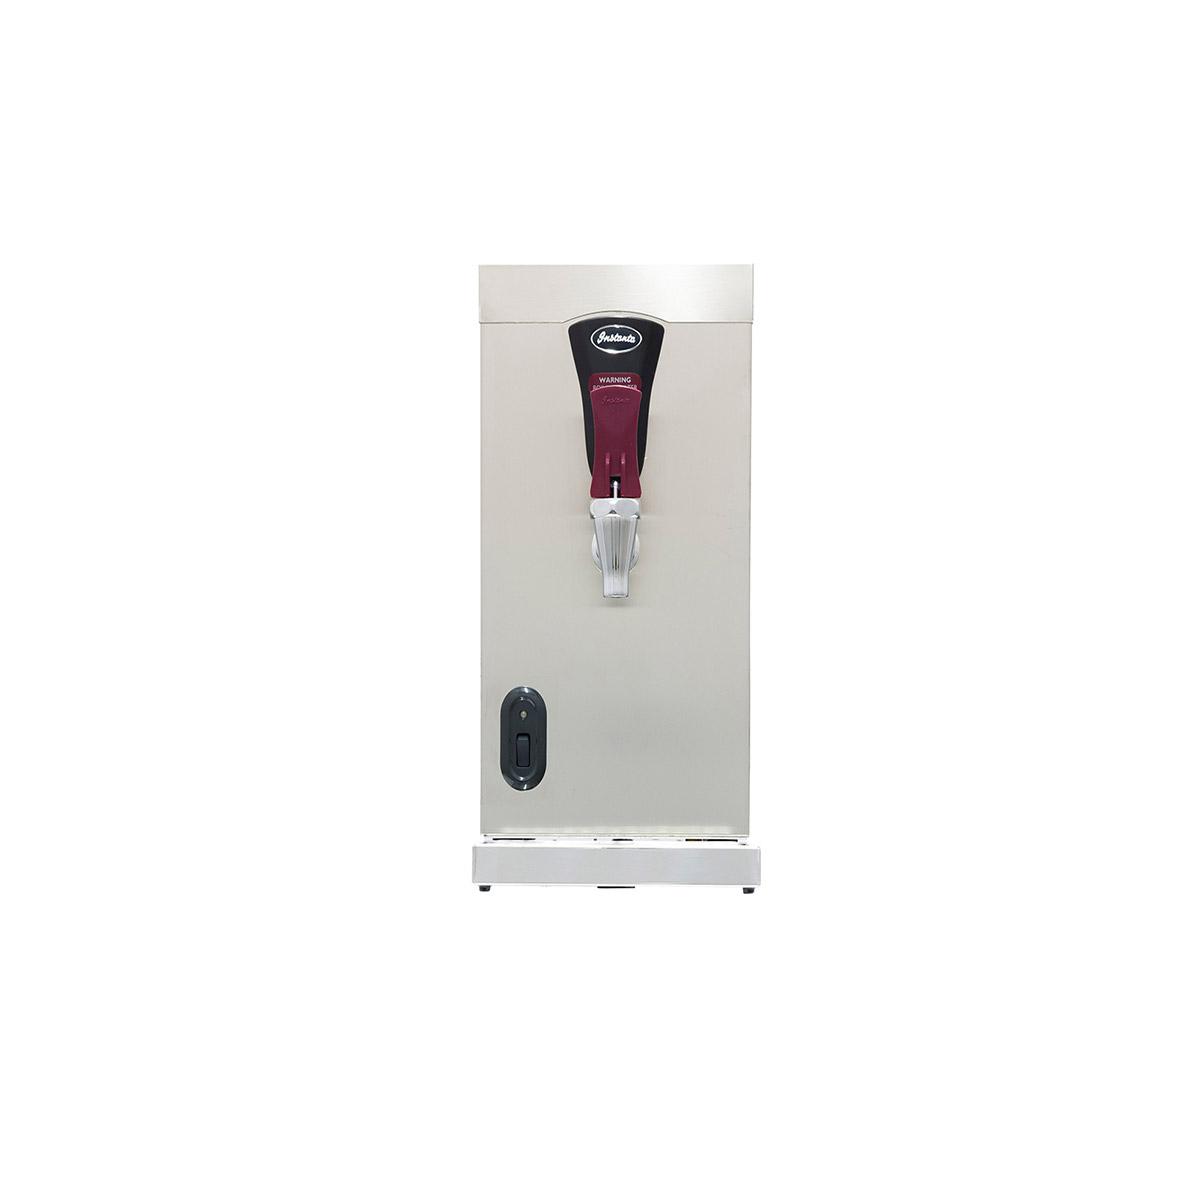 Instanta Sureflow Counter Top Water Boiler CTS3 3Ltr